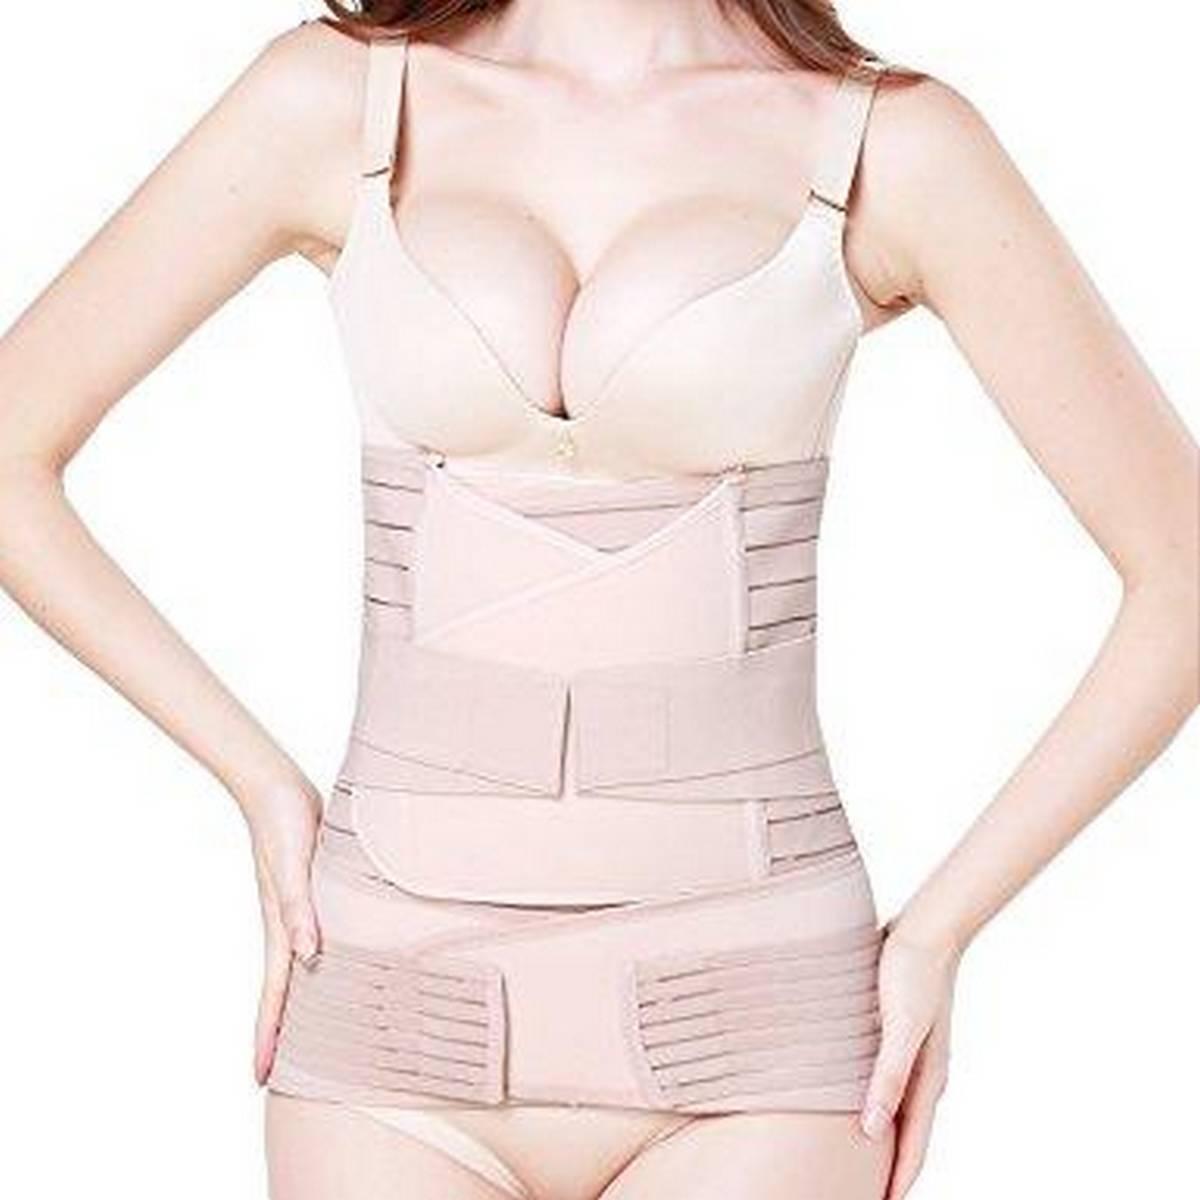 Postpartum Recovery Body Shaper Belt Slimming Maternity Band Belly Waist Shape wear